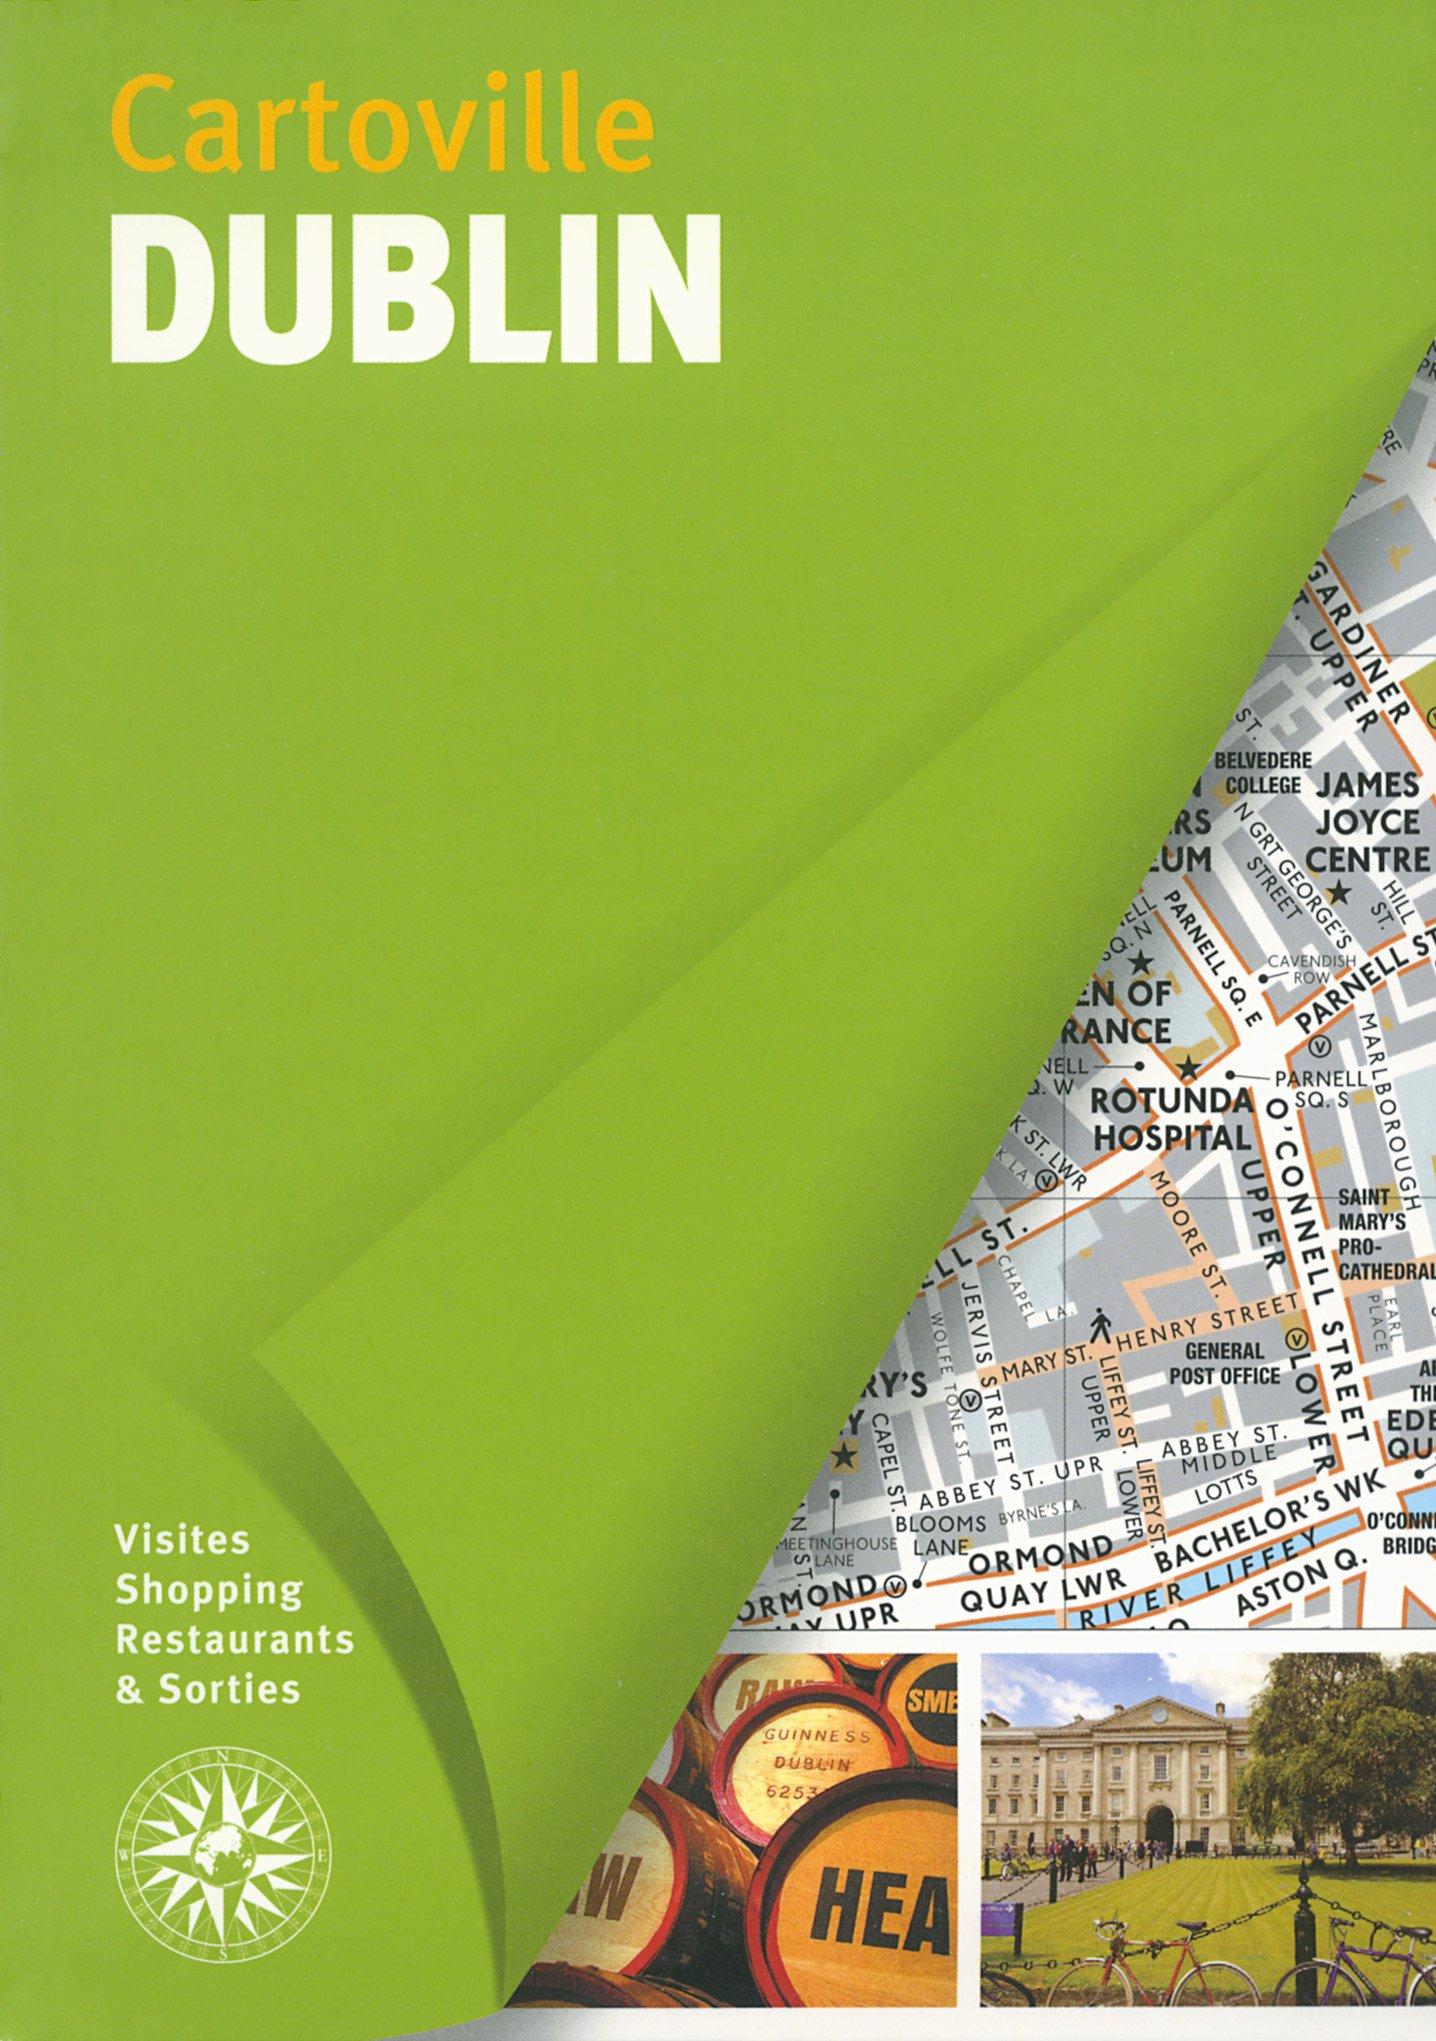 Dublin Broché – 2 janvier 2014 Collectifs Gallimard Loisirs 2742434275 Europe